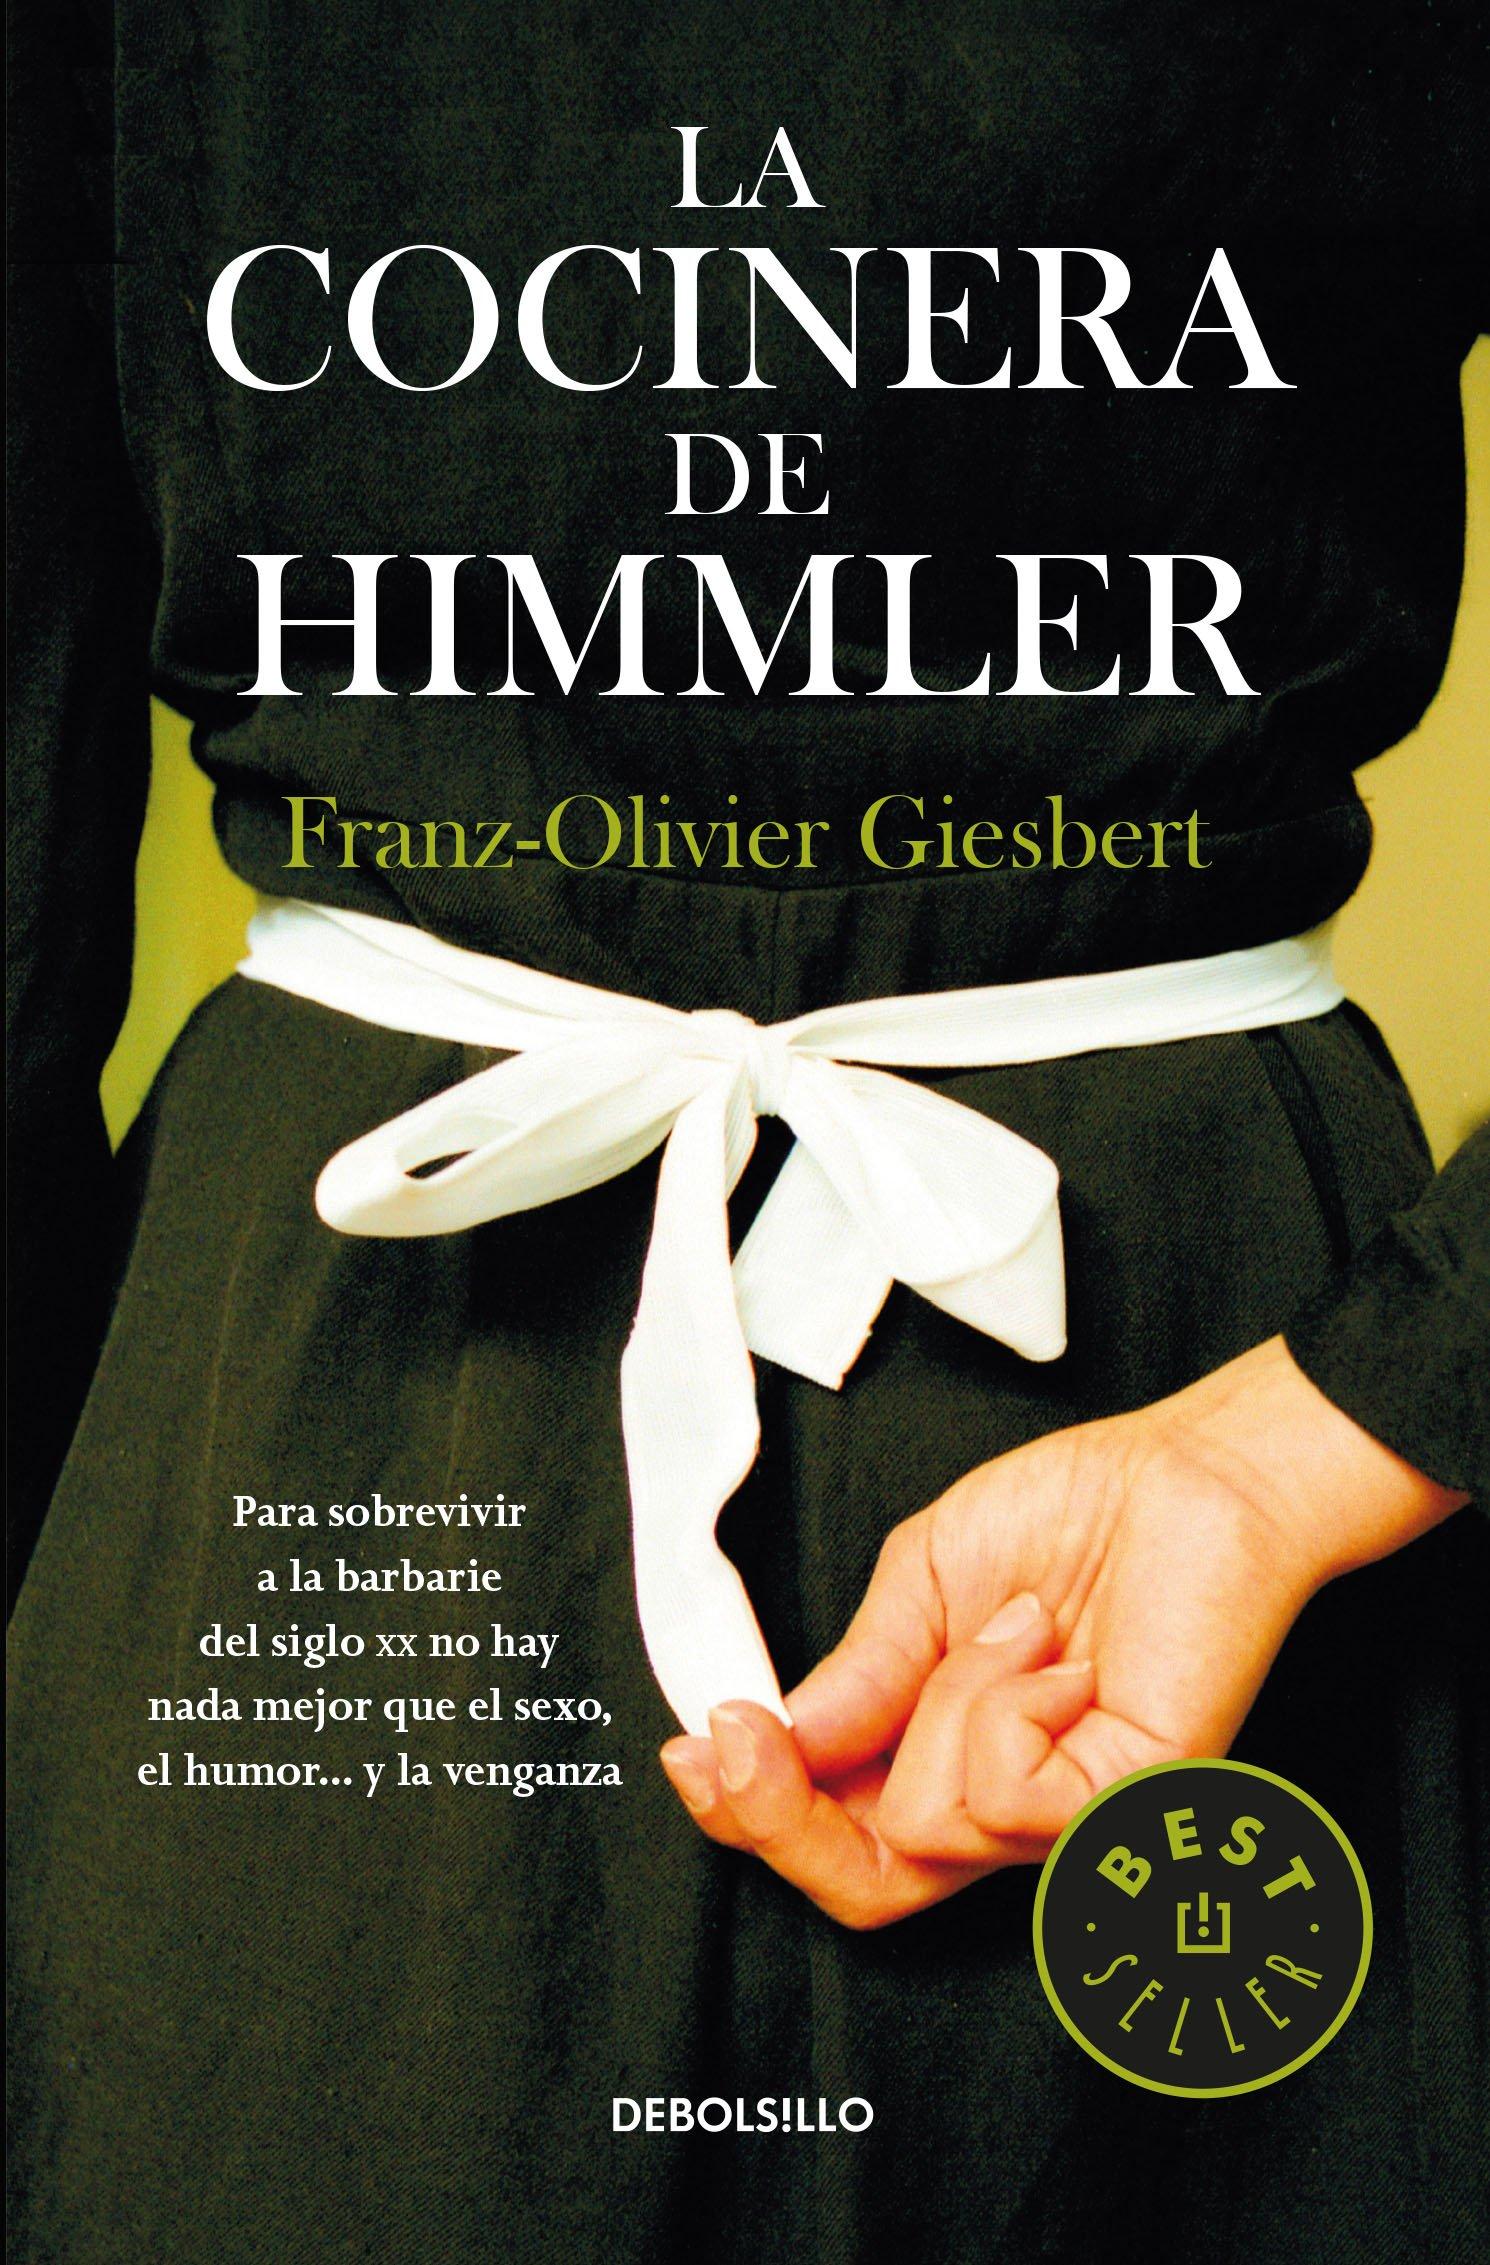 Cocinera de Himmler, La: Franz- Olivier Gierbert: 9786073166157: Amazon.com: Books